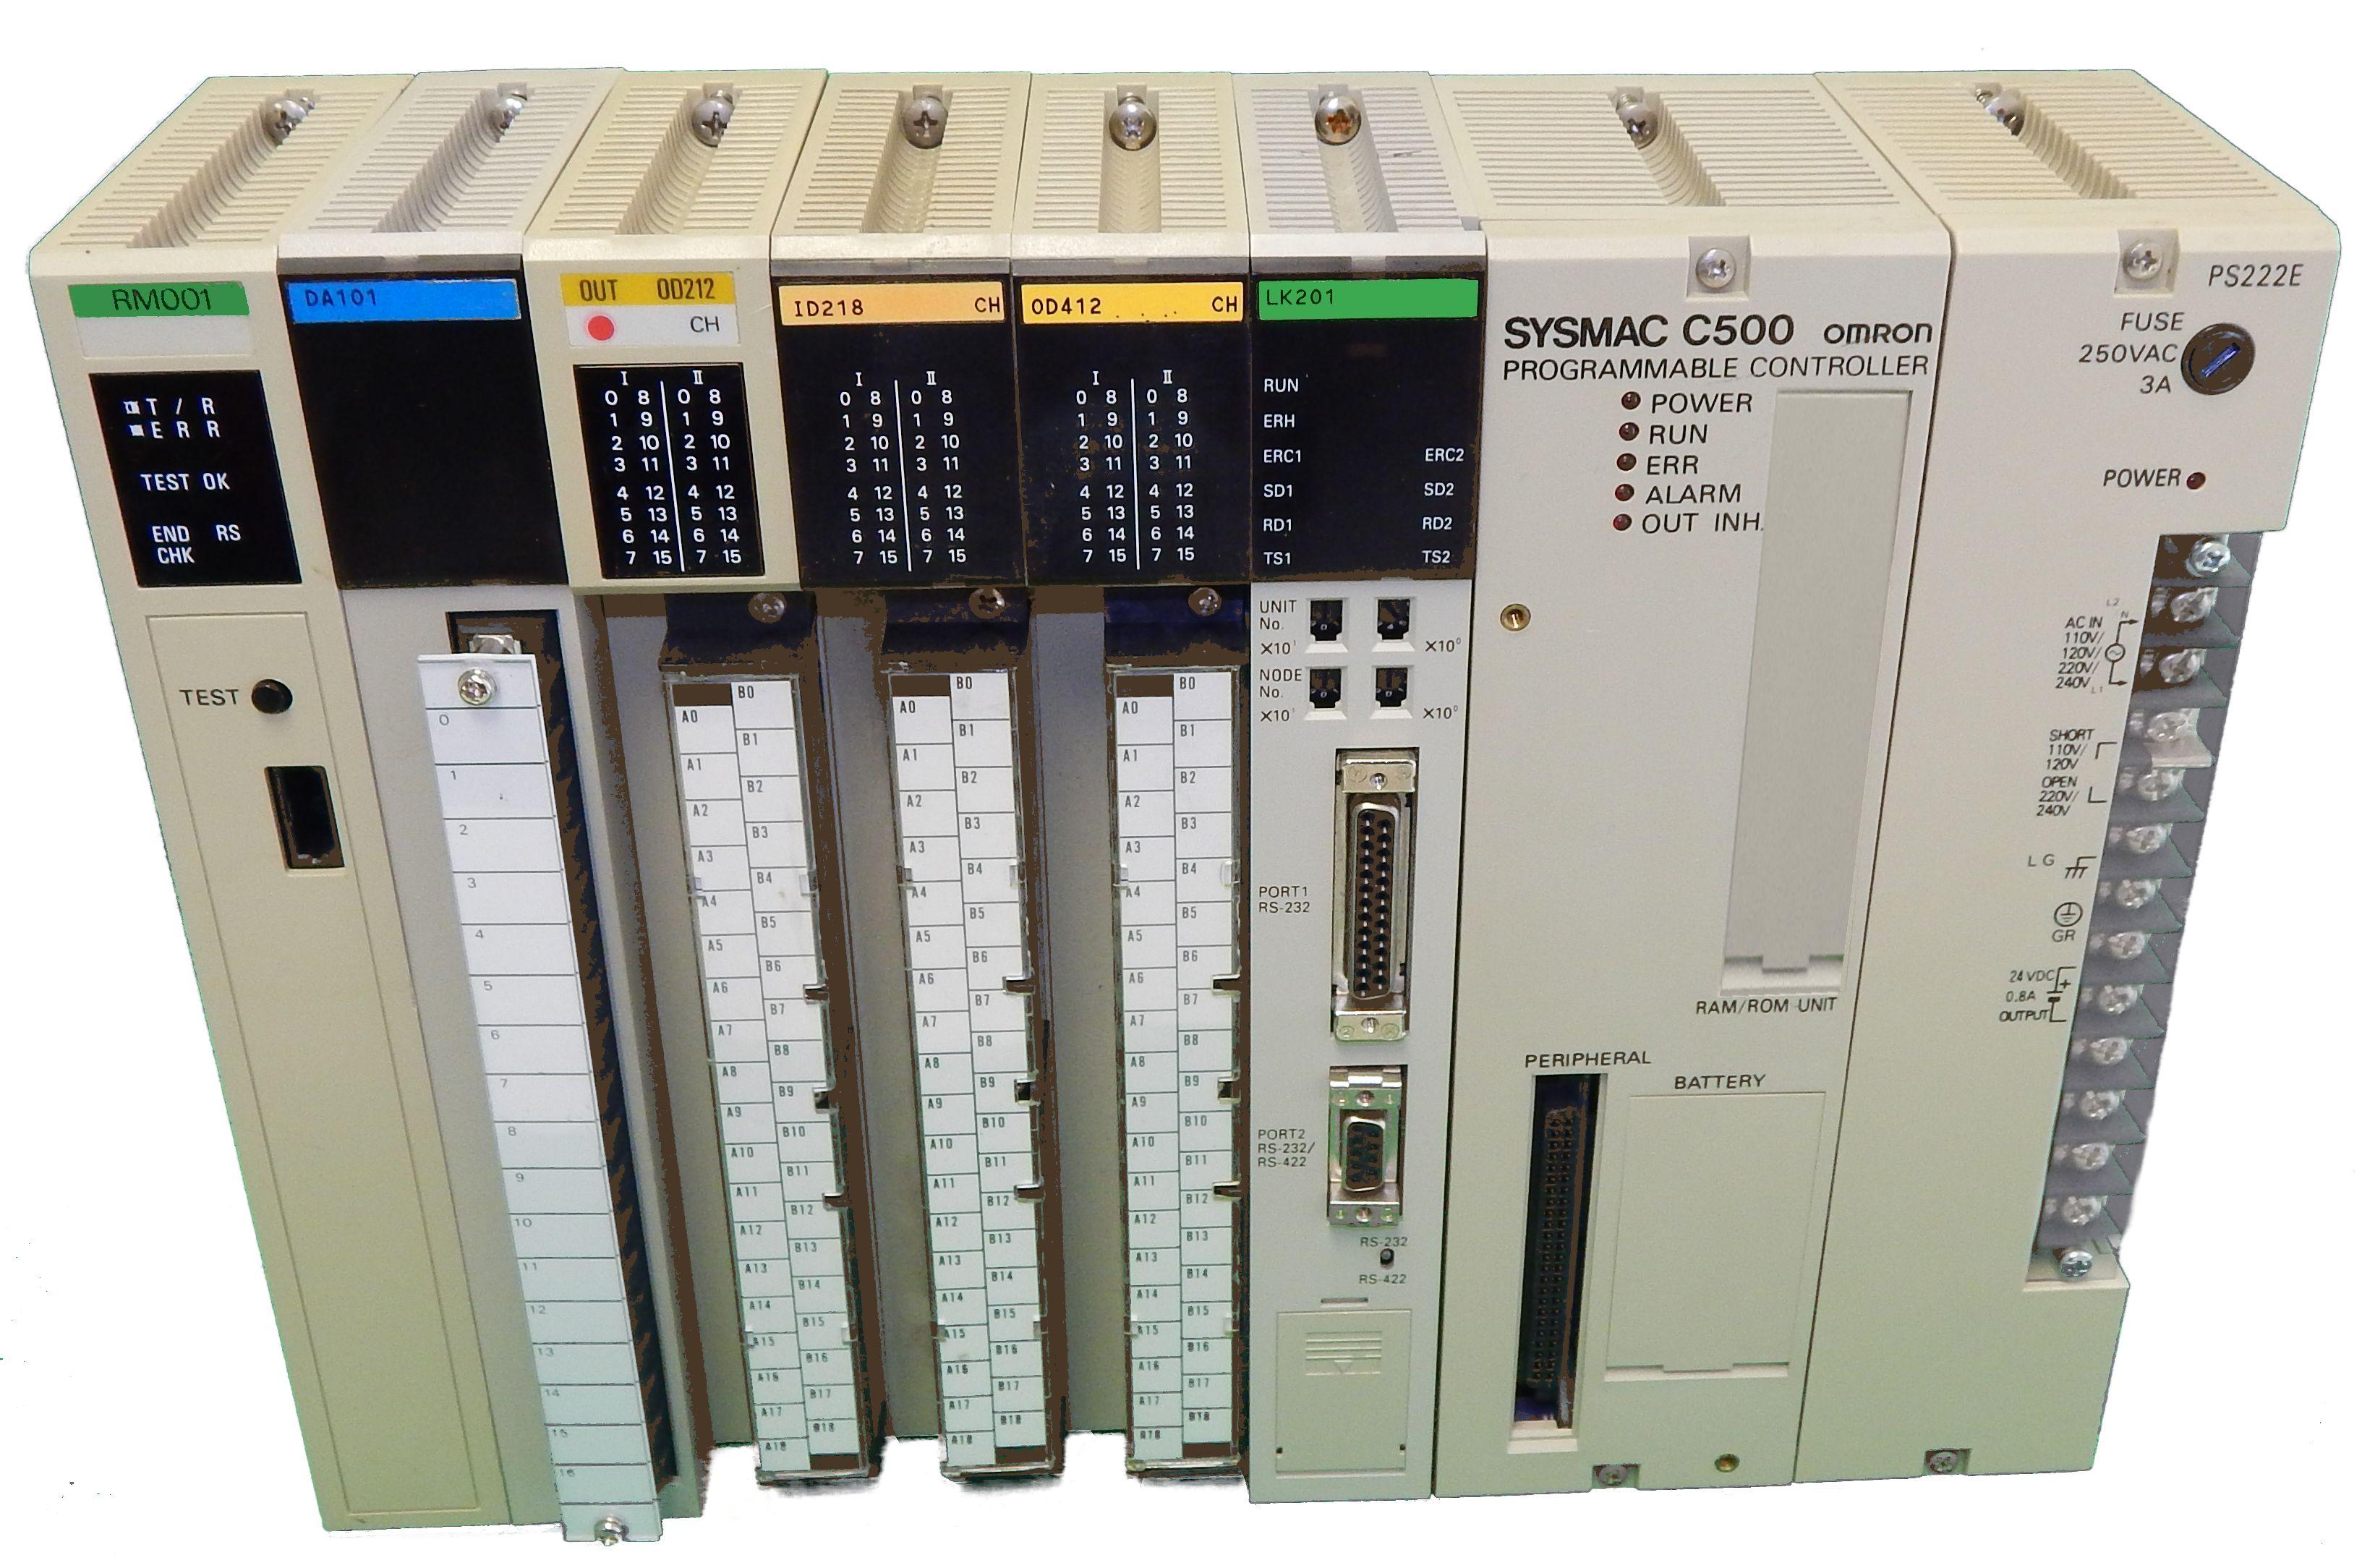 3G2C7-PAT02